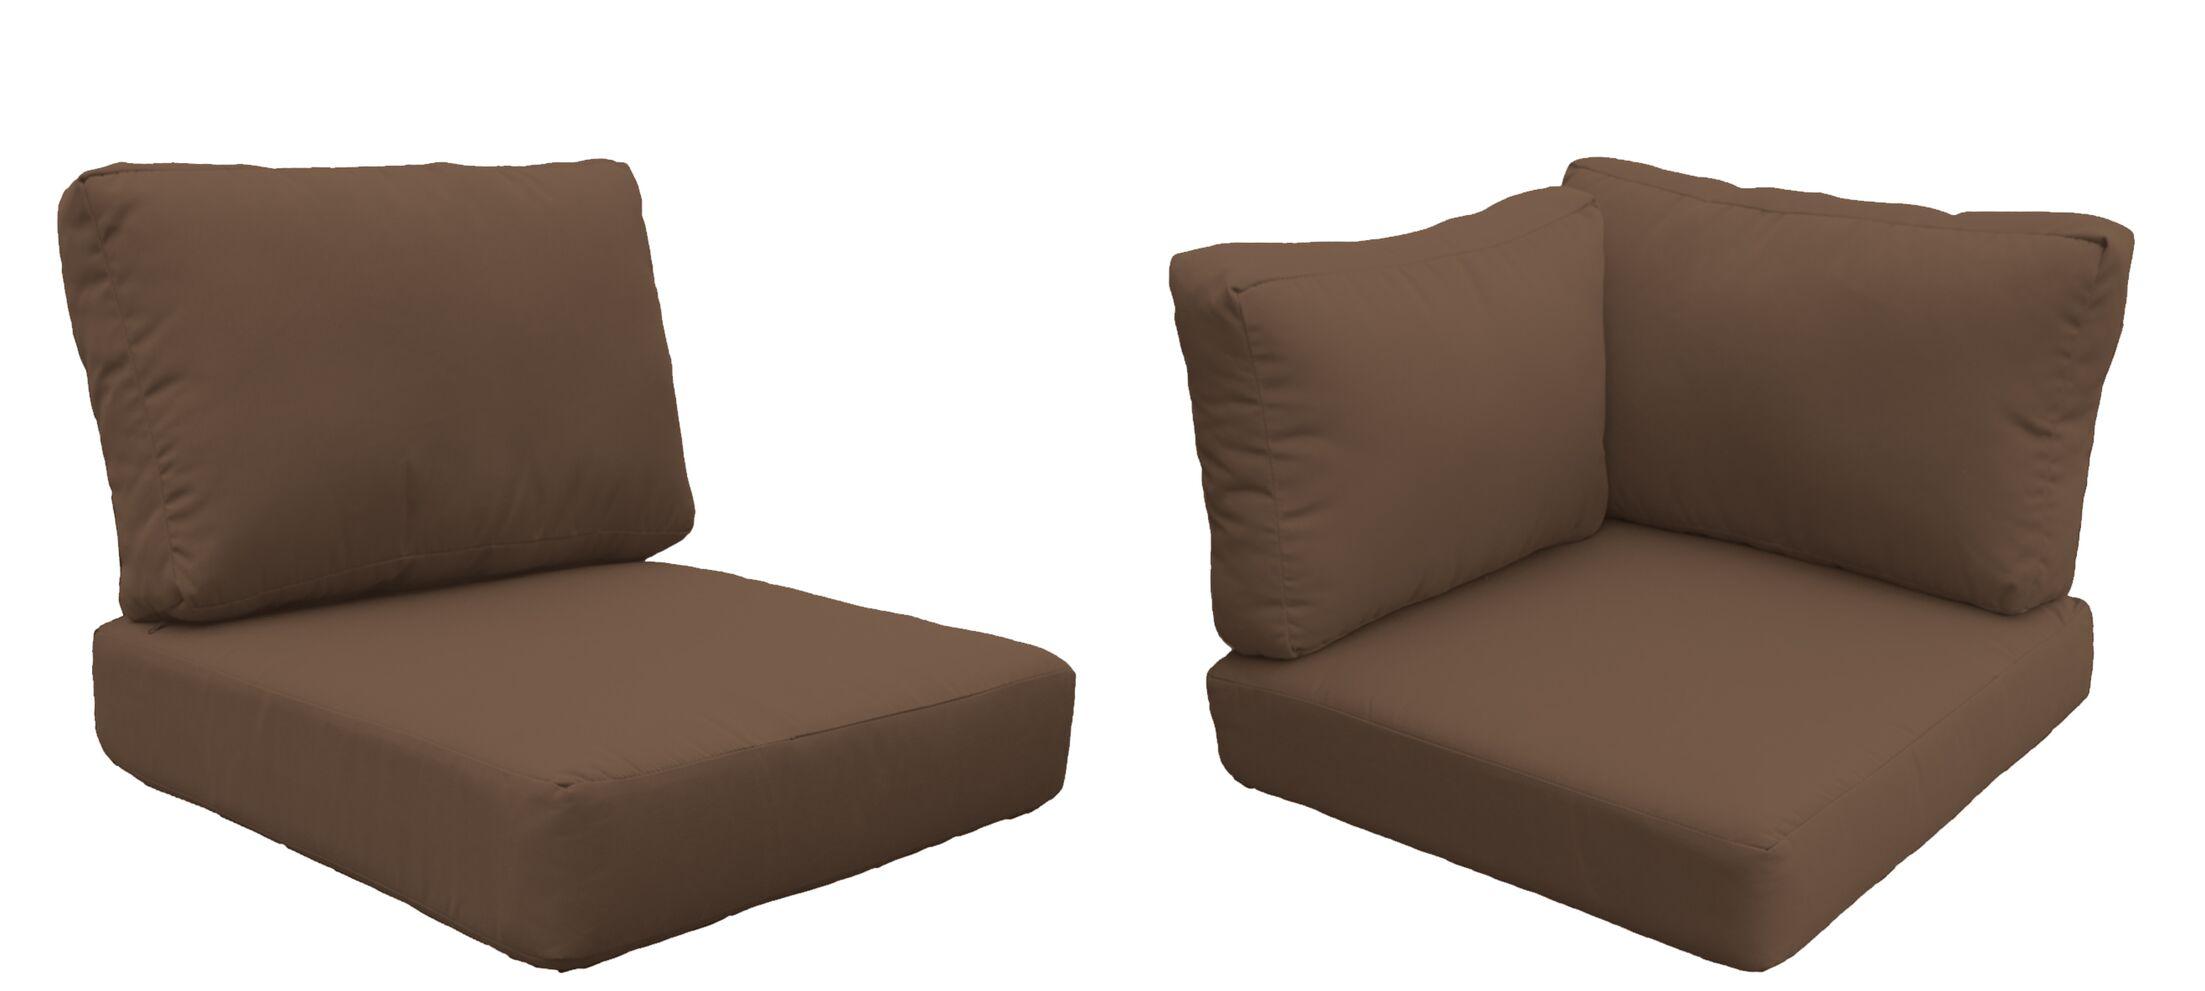 Eldredge 15 Piece Outdoor Cushion Set Fabric: Cocoa